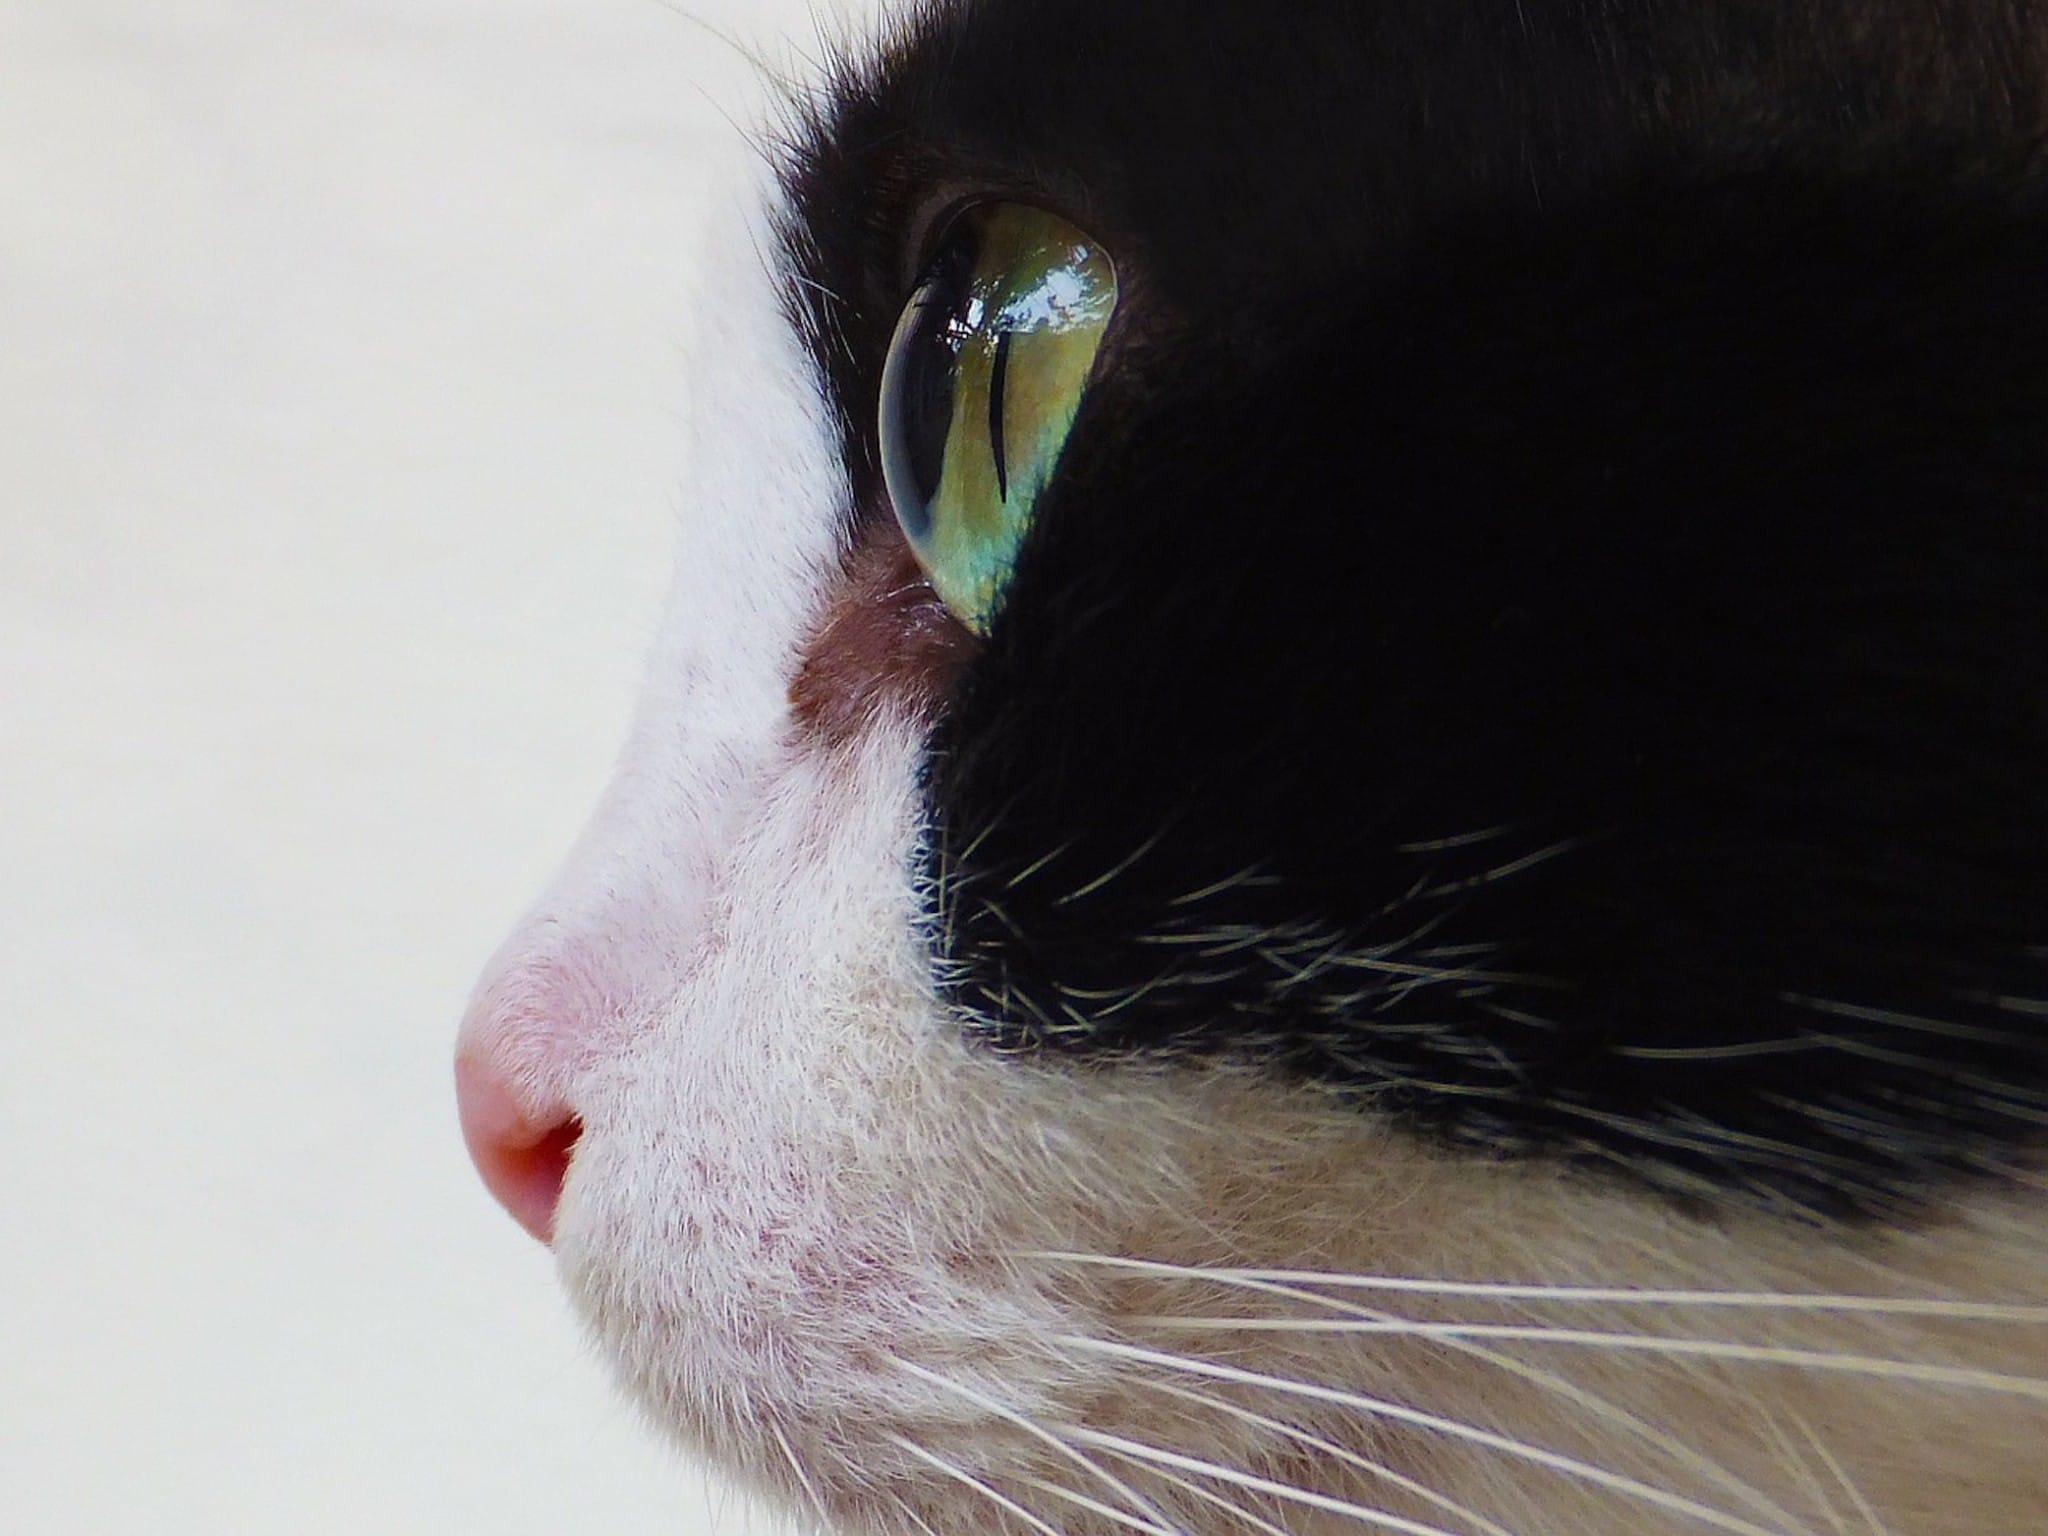 Katrina Kaif 3d Wallpaper Cat Eye Profile Wallpaper Free Hd Cute Cats